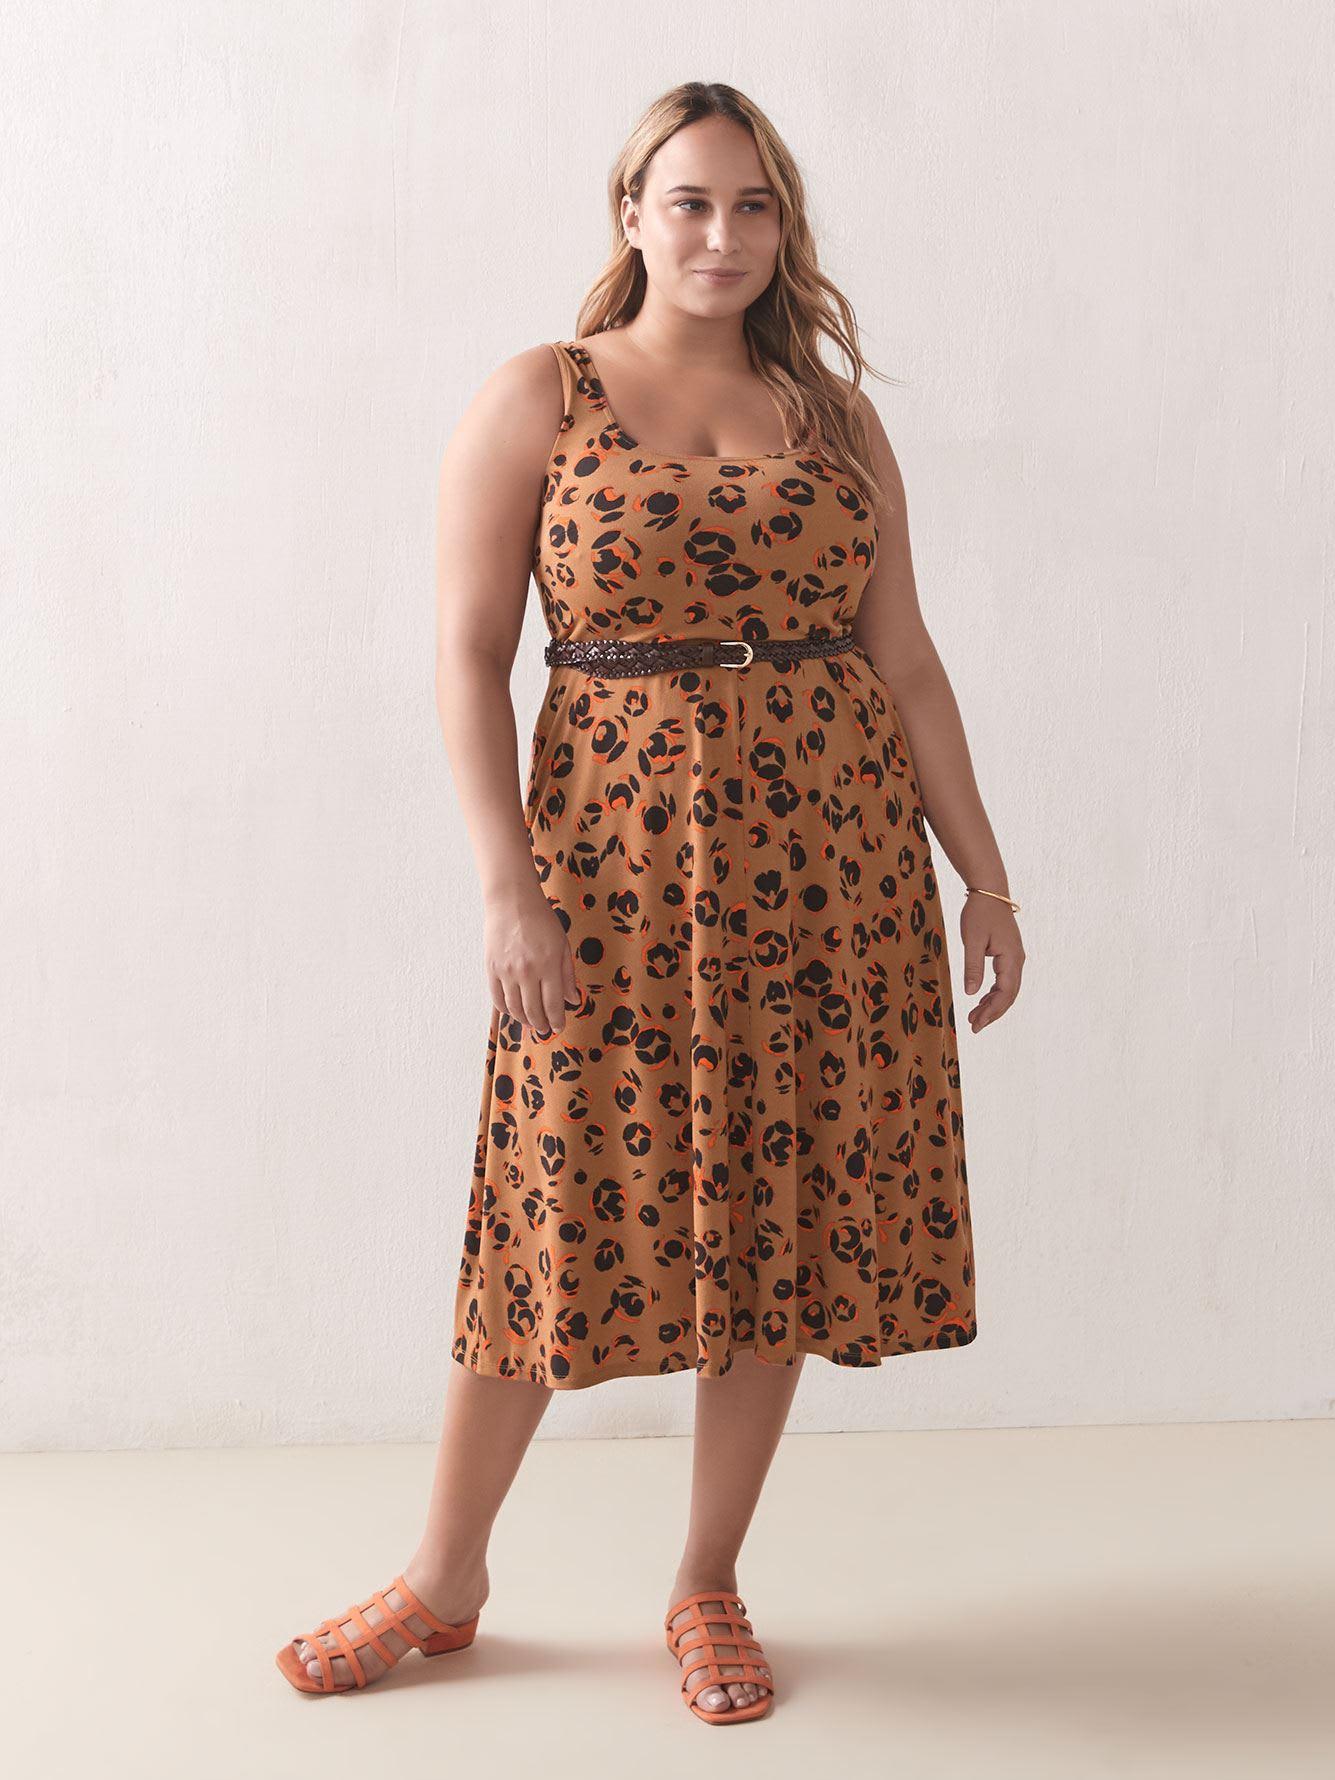 Printed Sleeveless Midi Fit & Flare Dress - Addition Elle